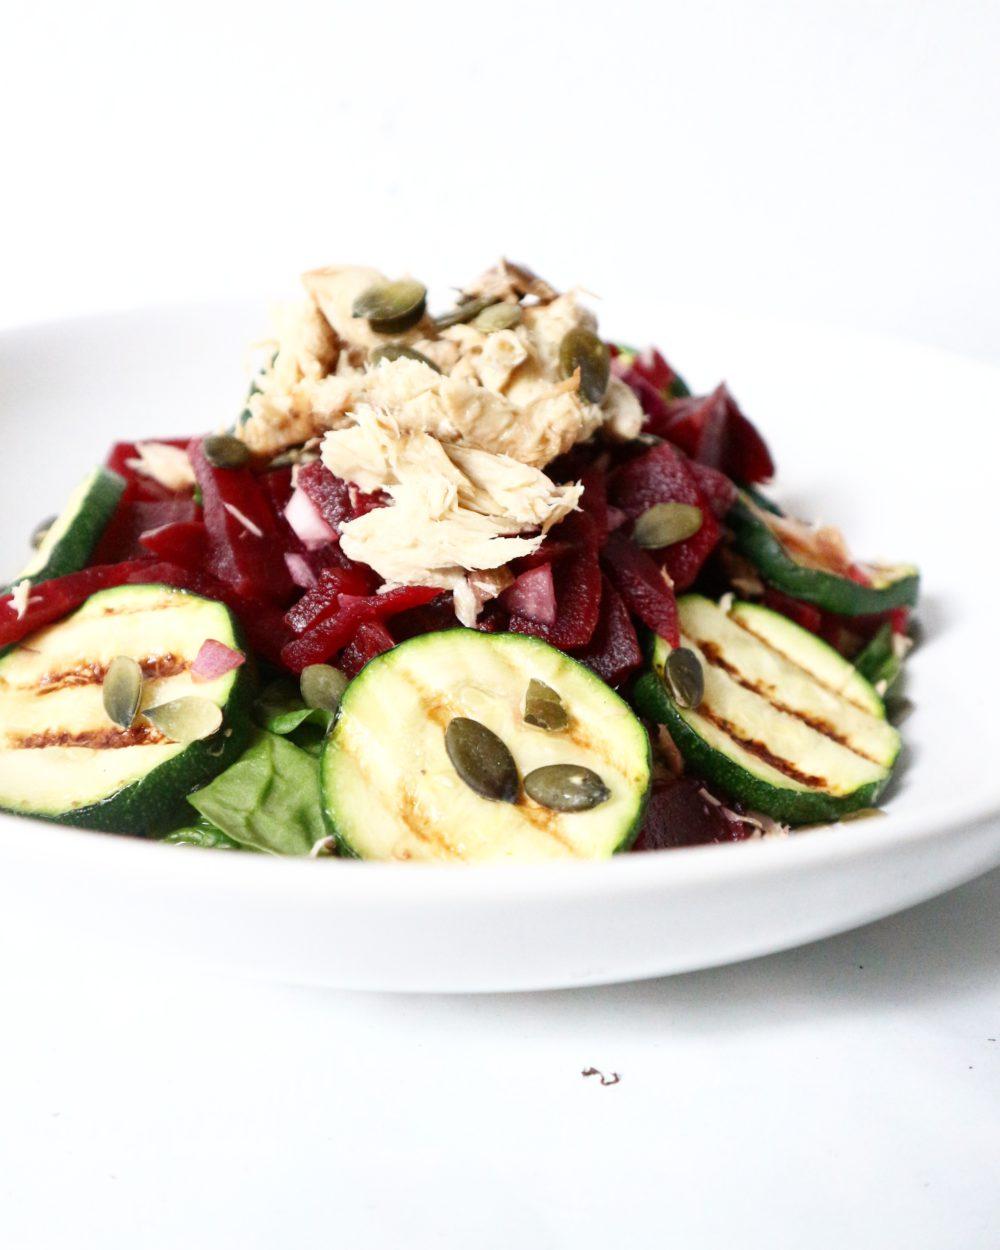 makreel rode bieten salade courgette recept gymjunkies.nl